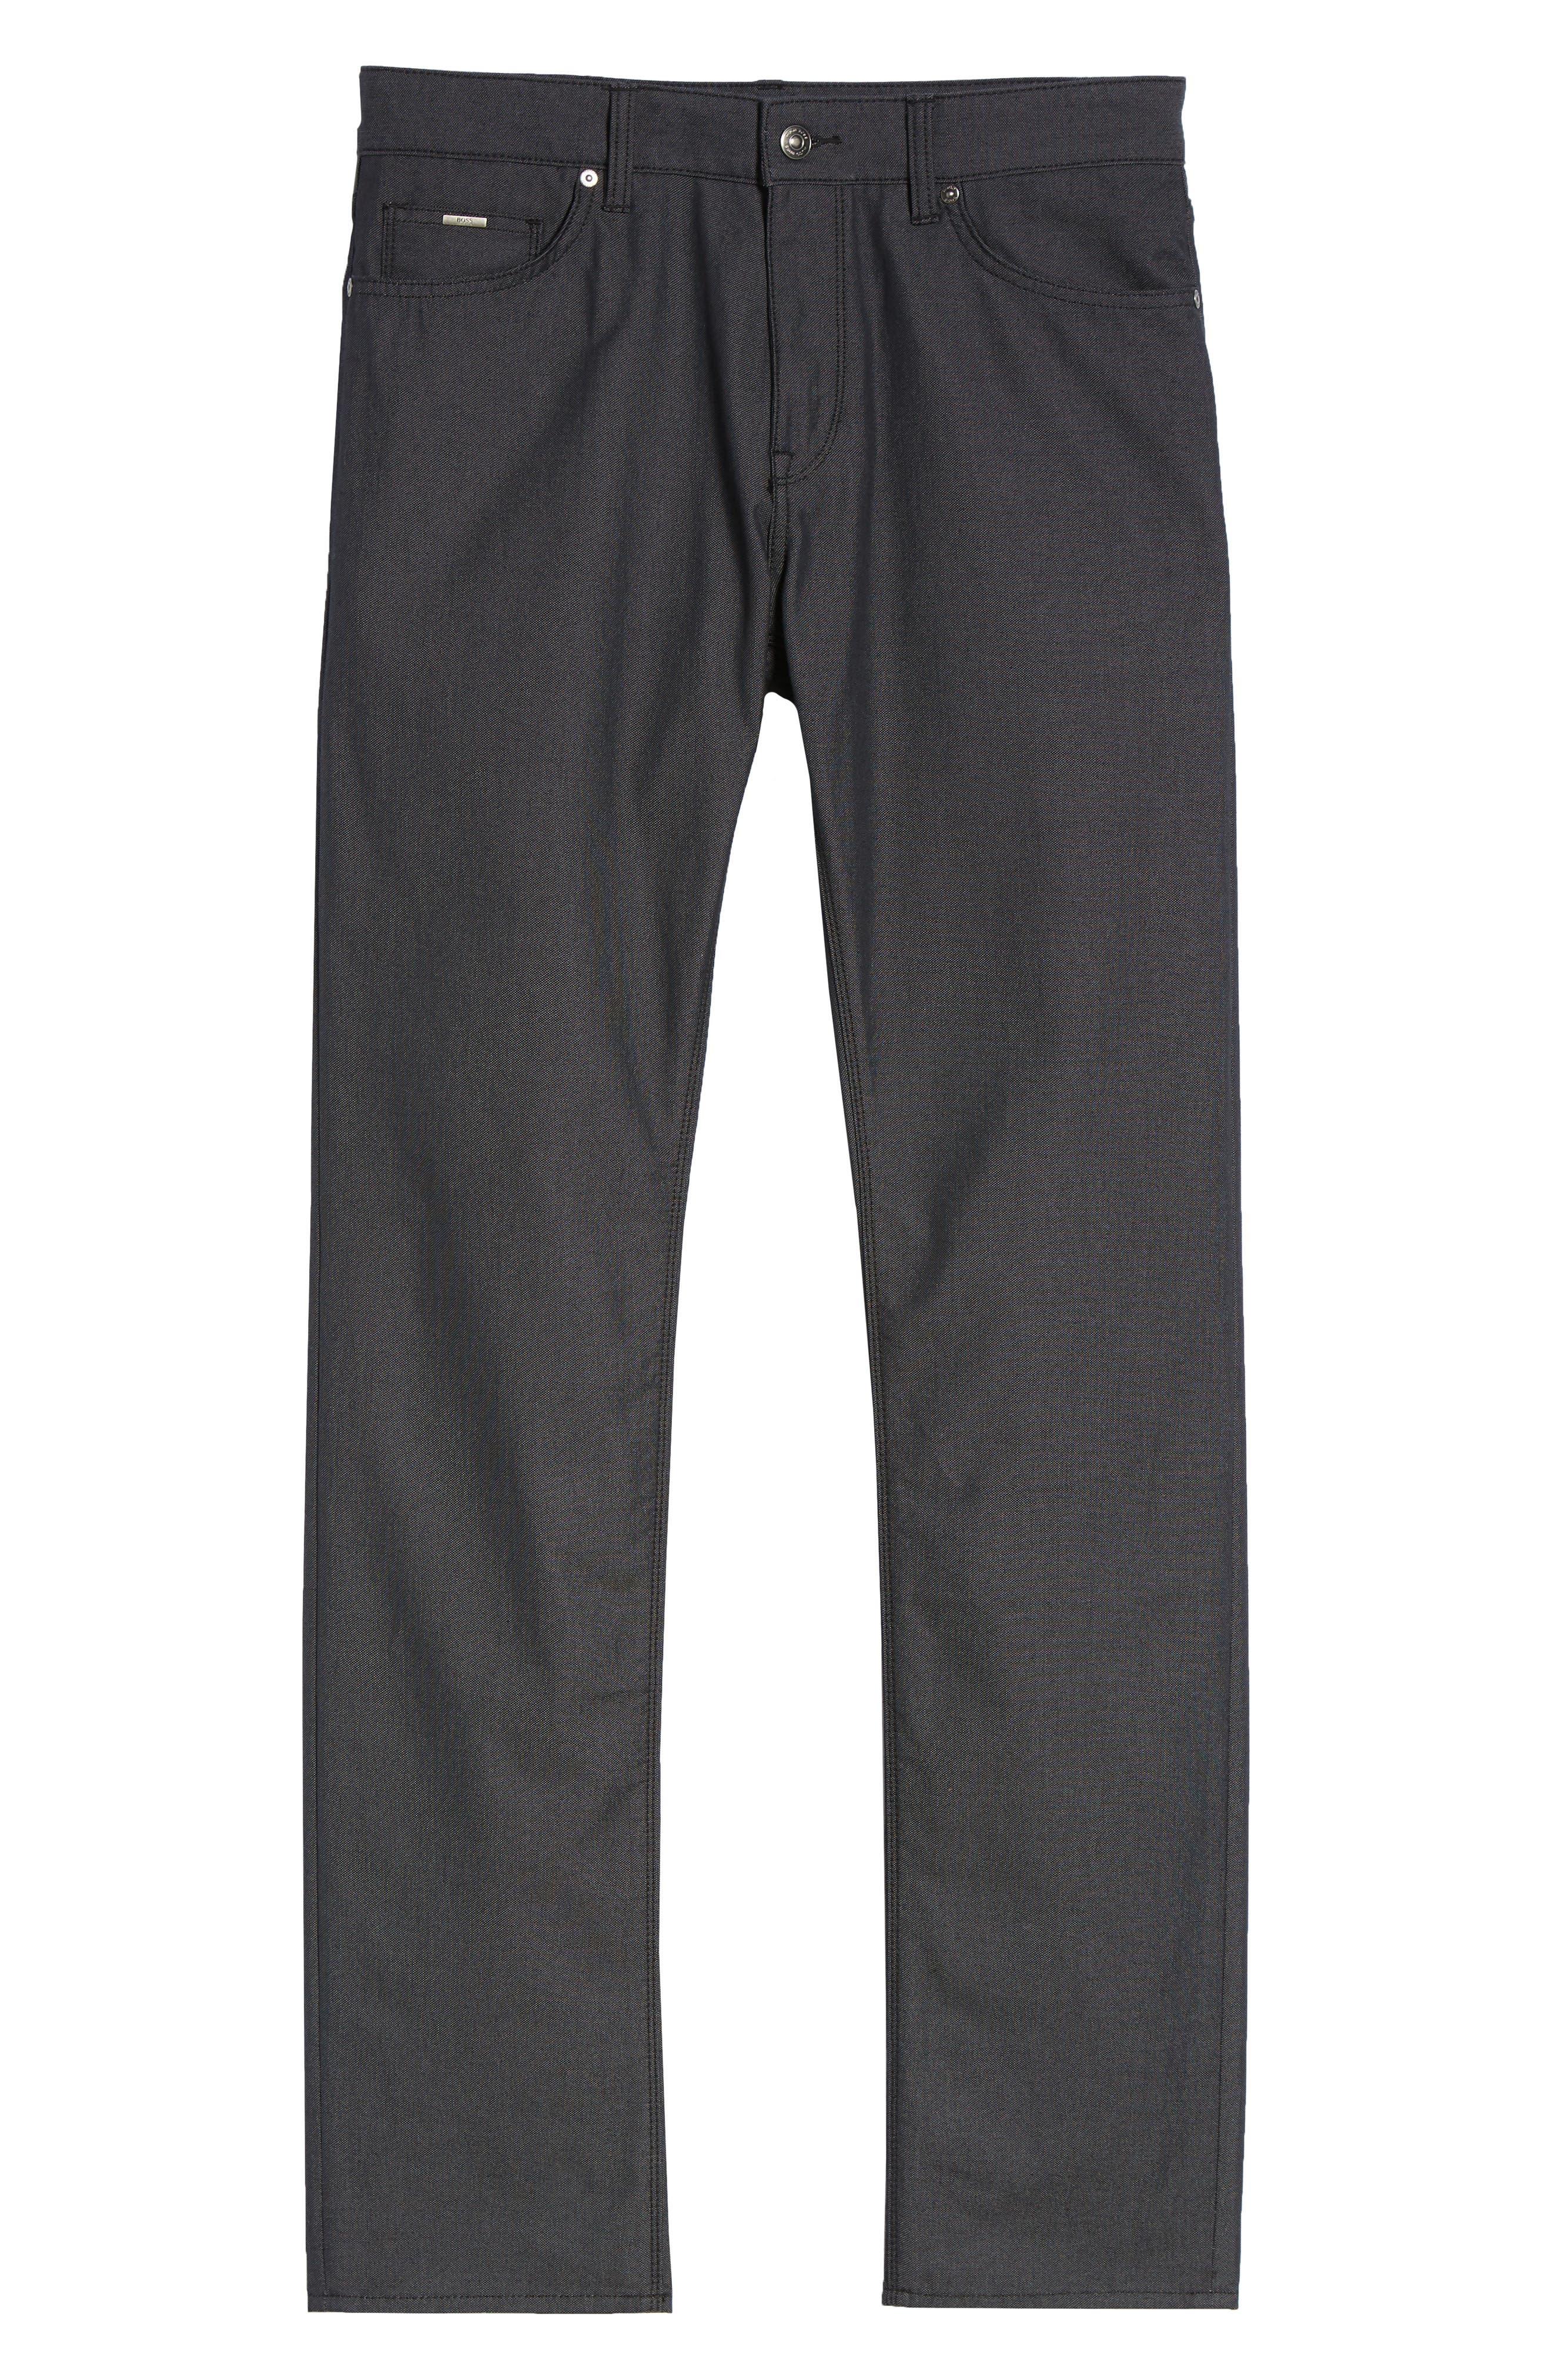 Maine Straight Leg Jeans,                             Alternate thumbnail 6, color,                             001